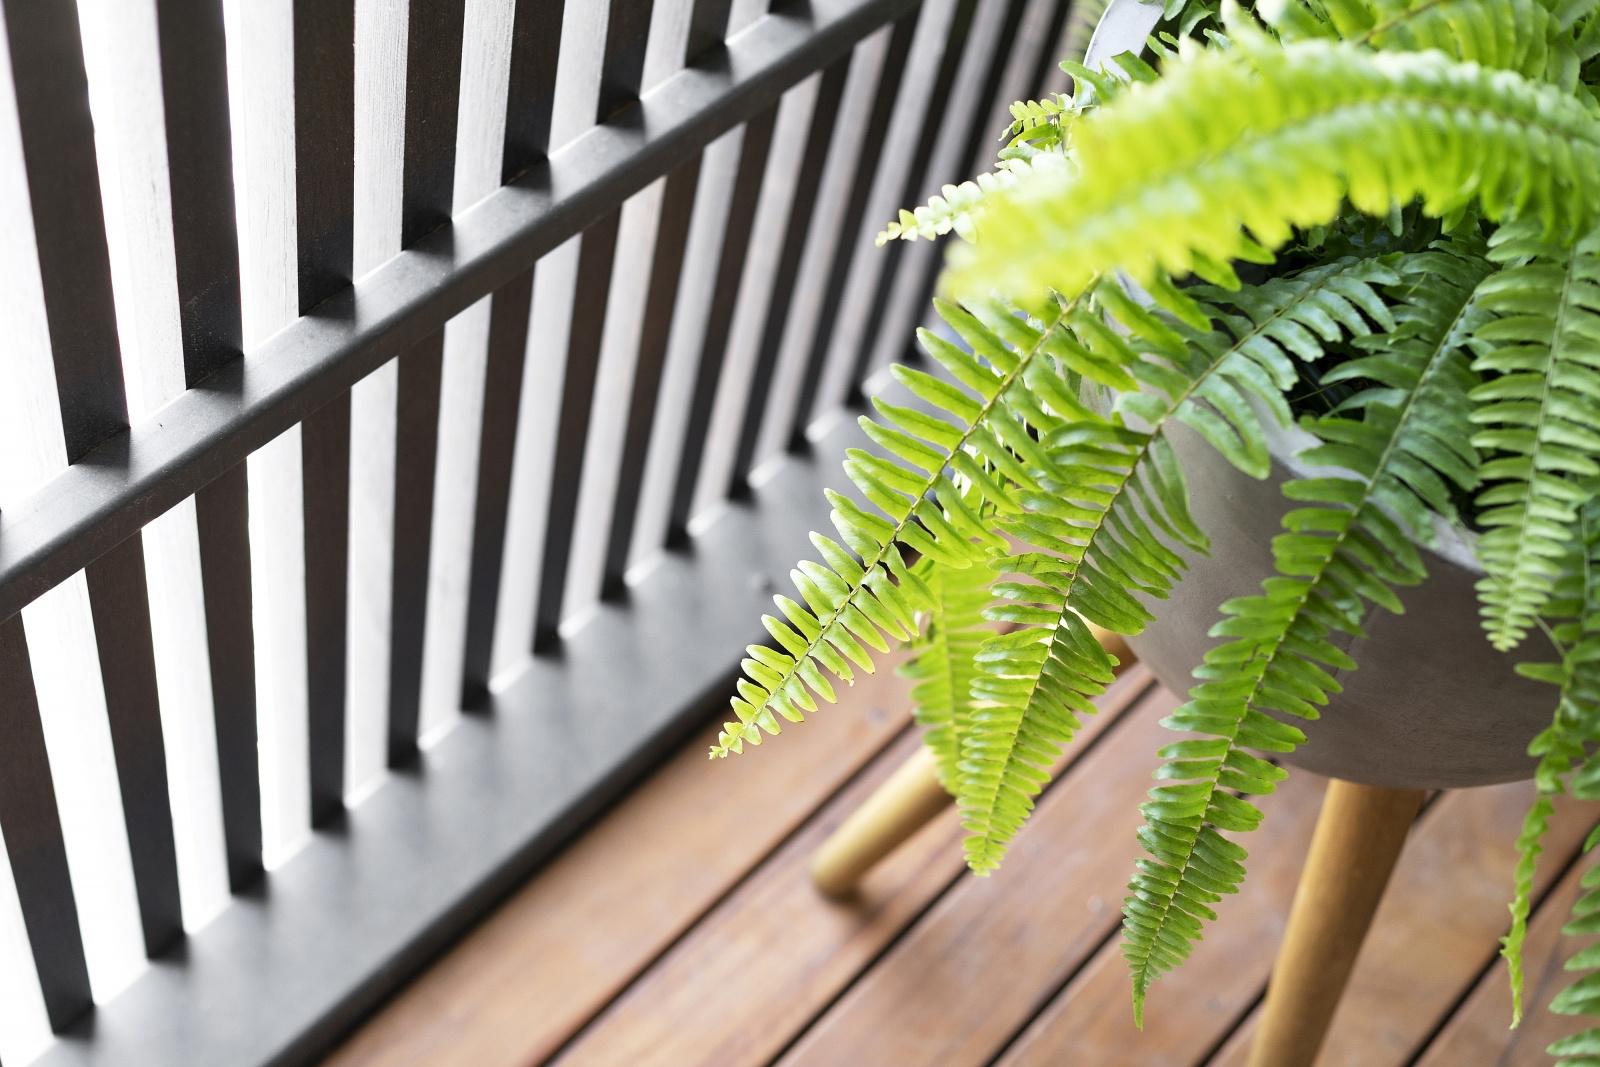 lifespaces_group_bluestonehouse_inside_balcony.jpg